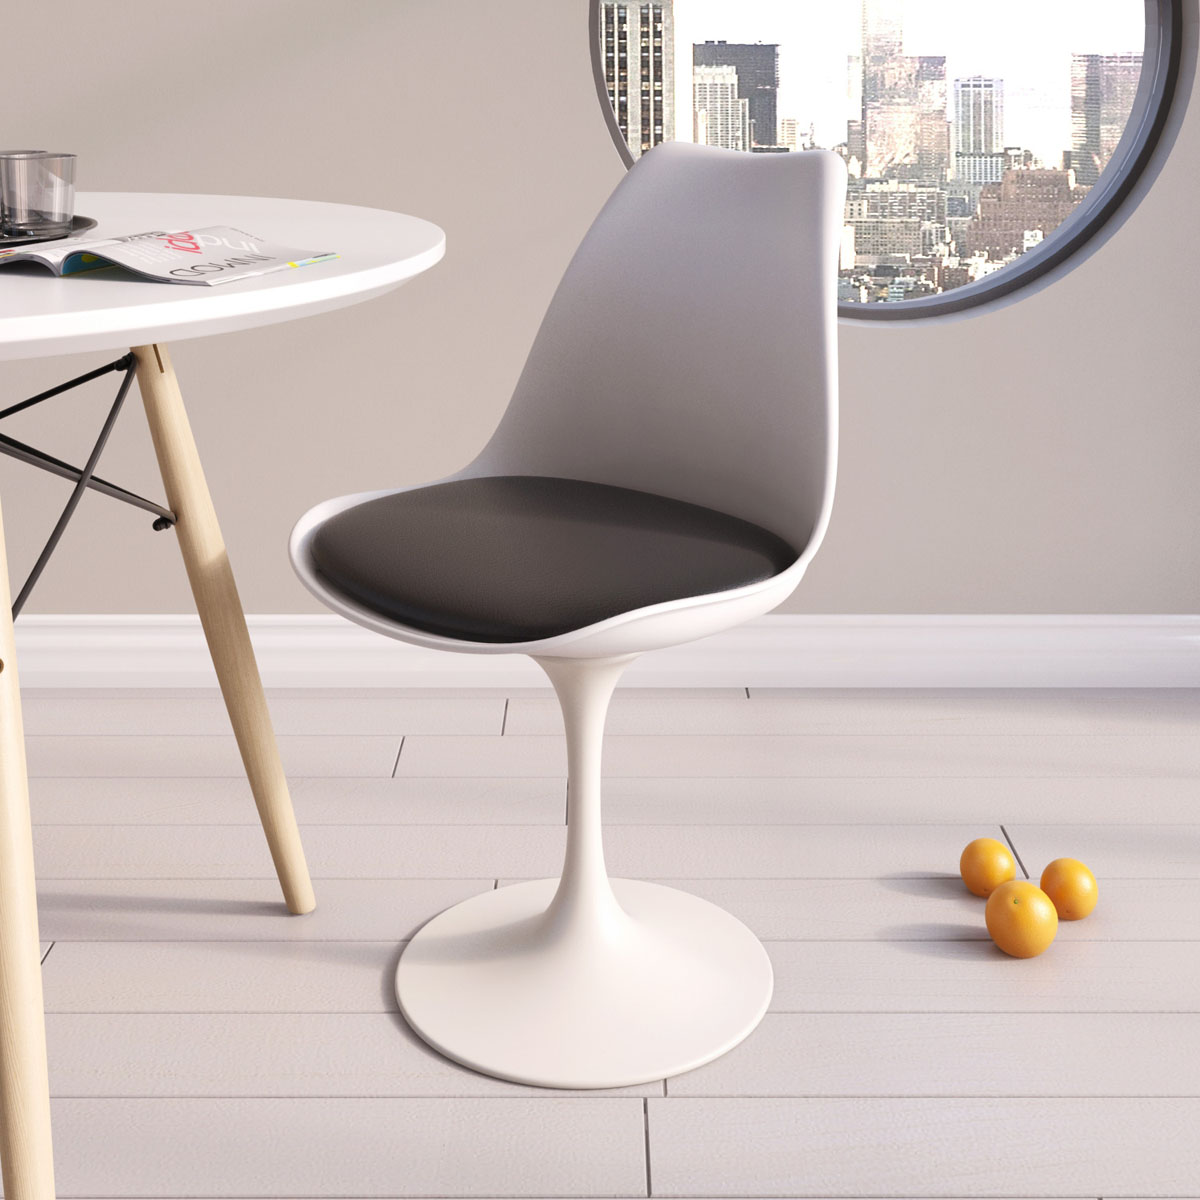 Sensational Saarinen Style Tulip Side Chair Andrewgaddart Wooden Chair Designs For Living Room Andrewgaddartcom